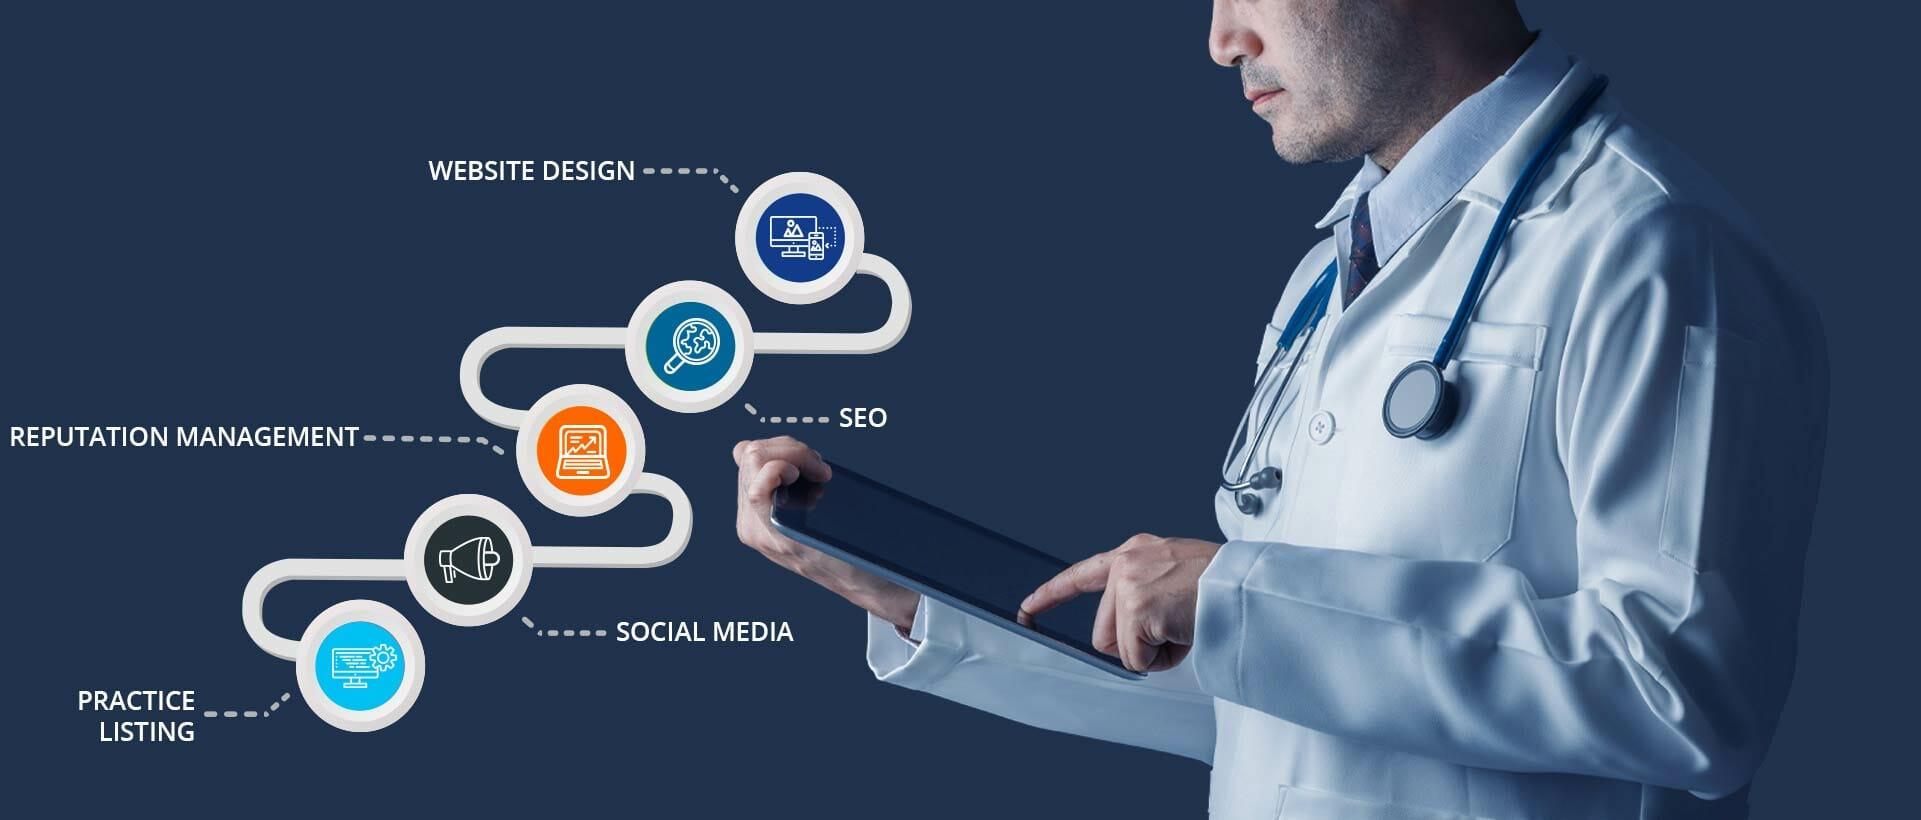 Healthcare marketing consultant 55